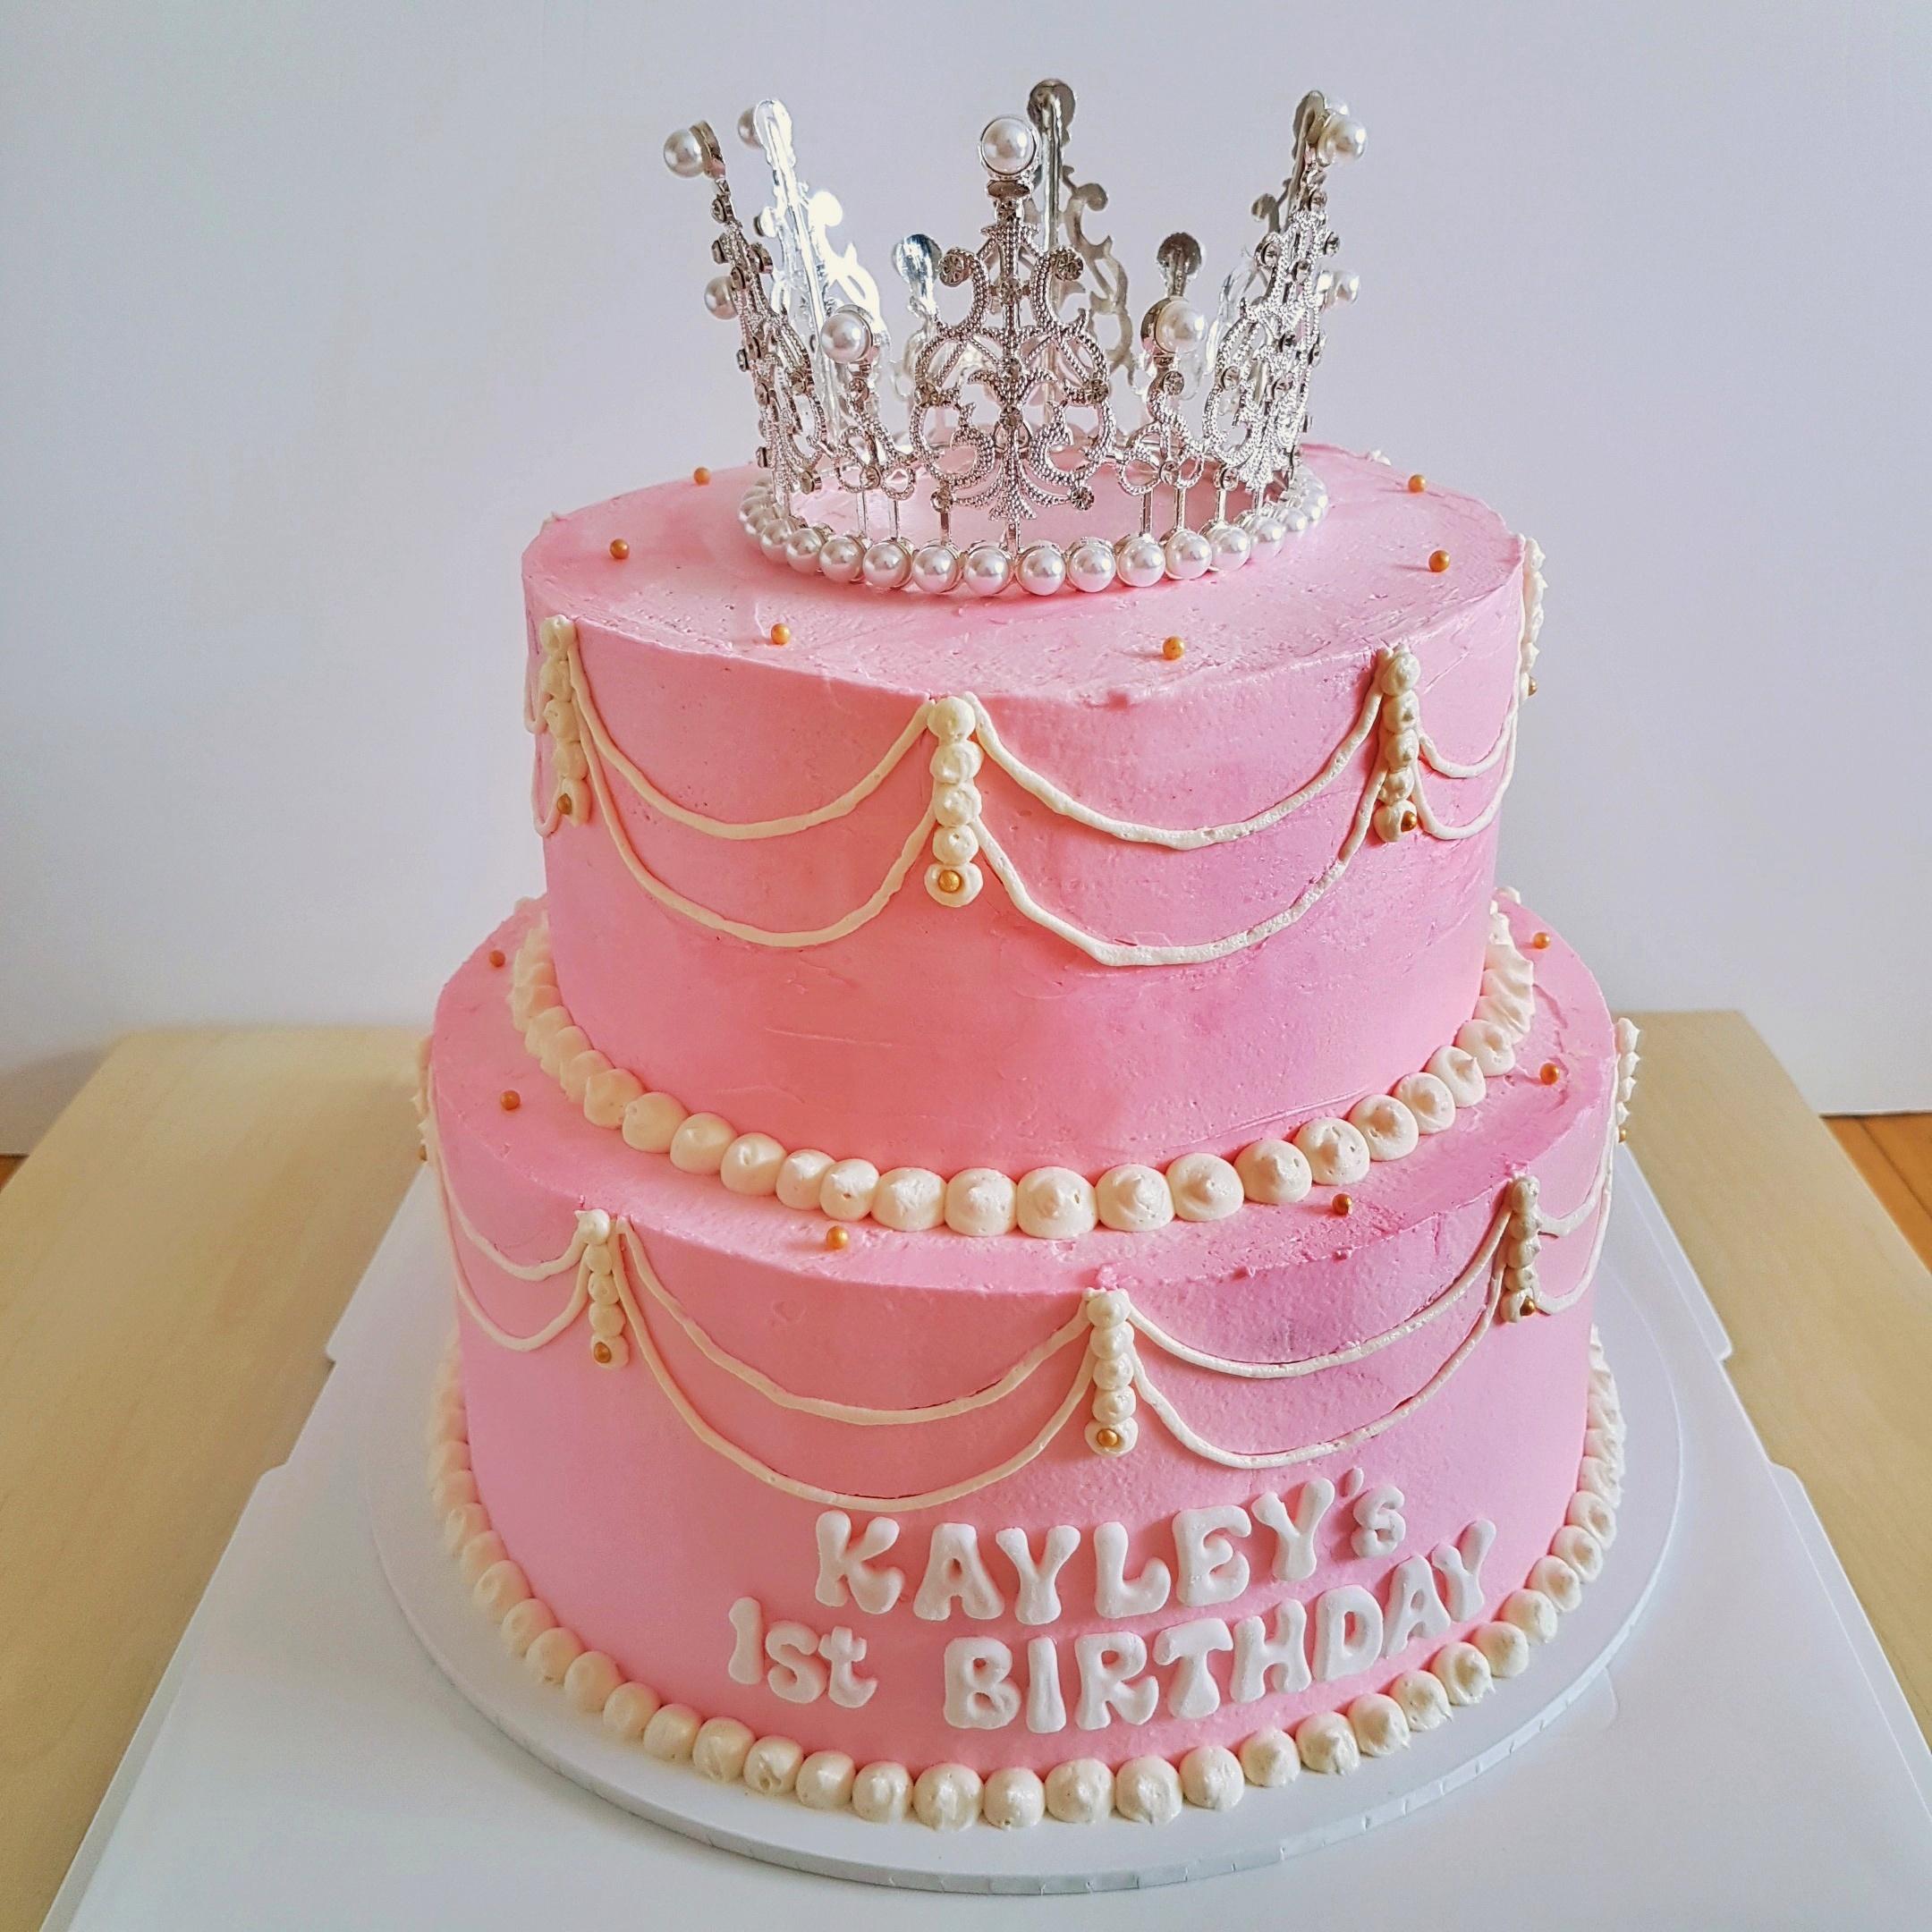 Princess Cake with Tiara